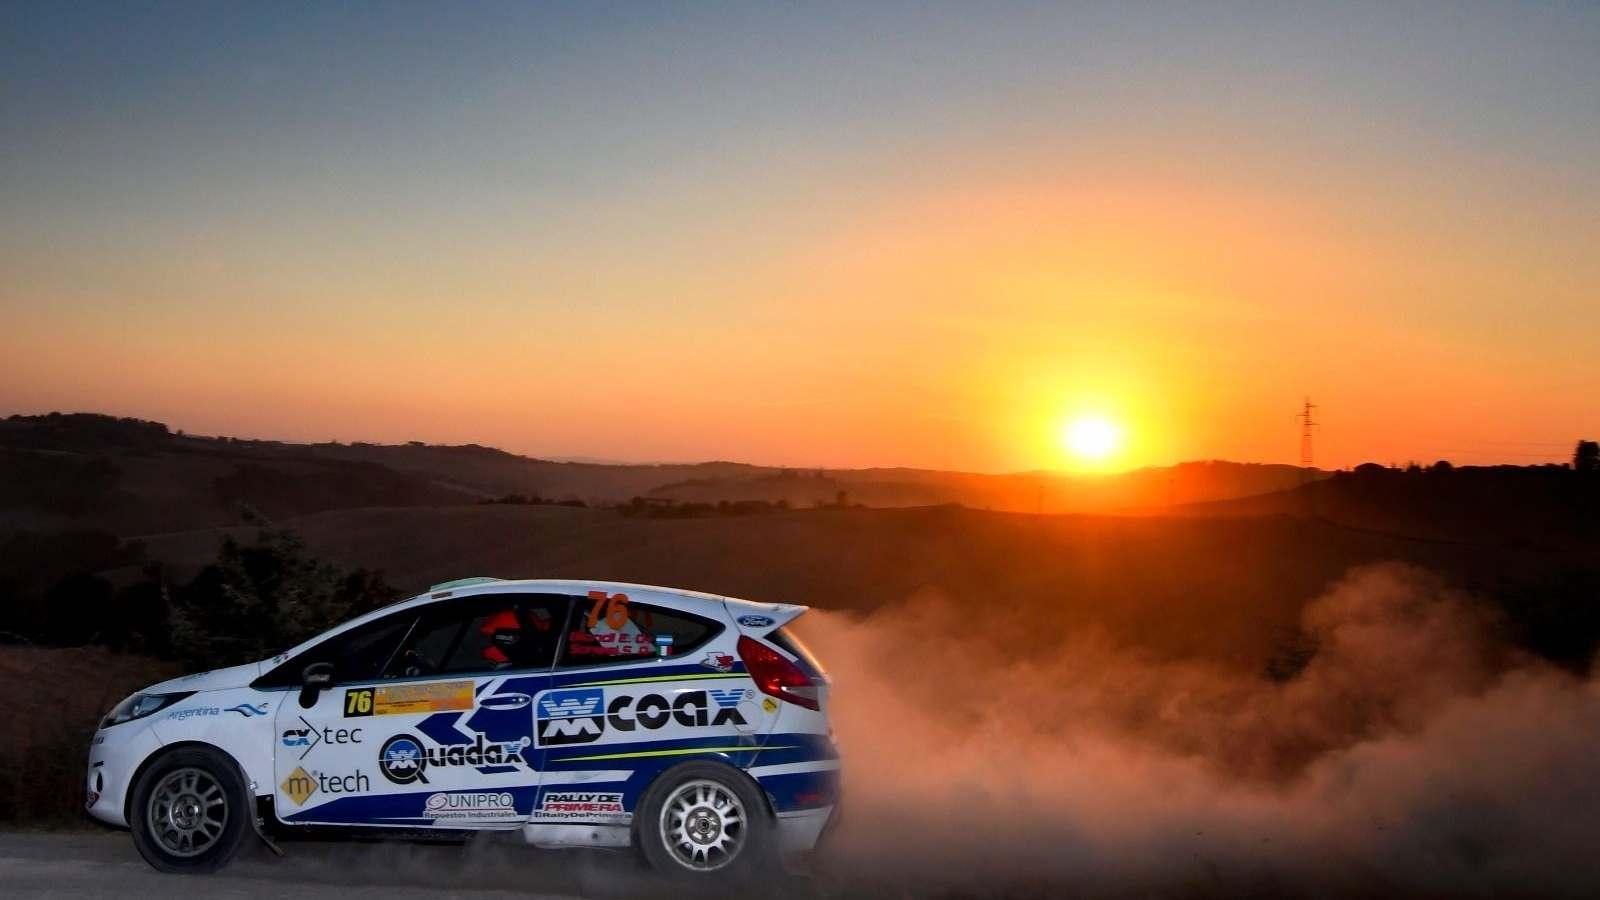 La Storia - Gass Racing